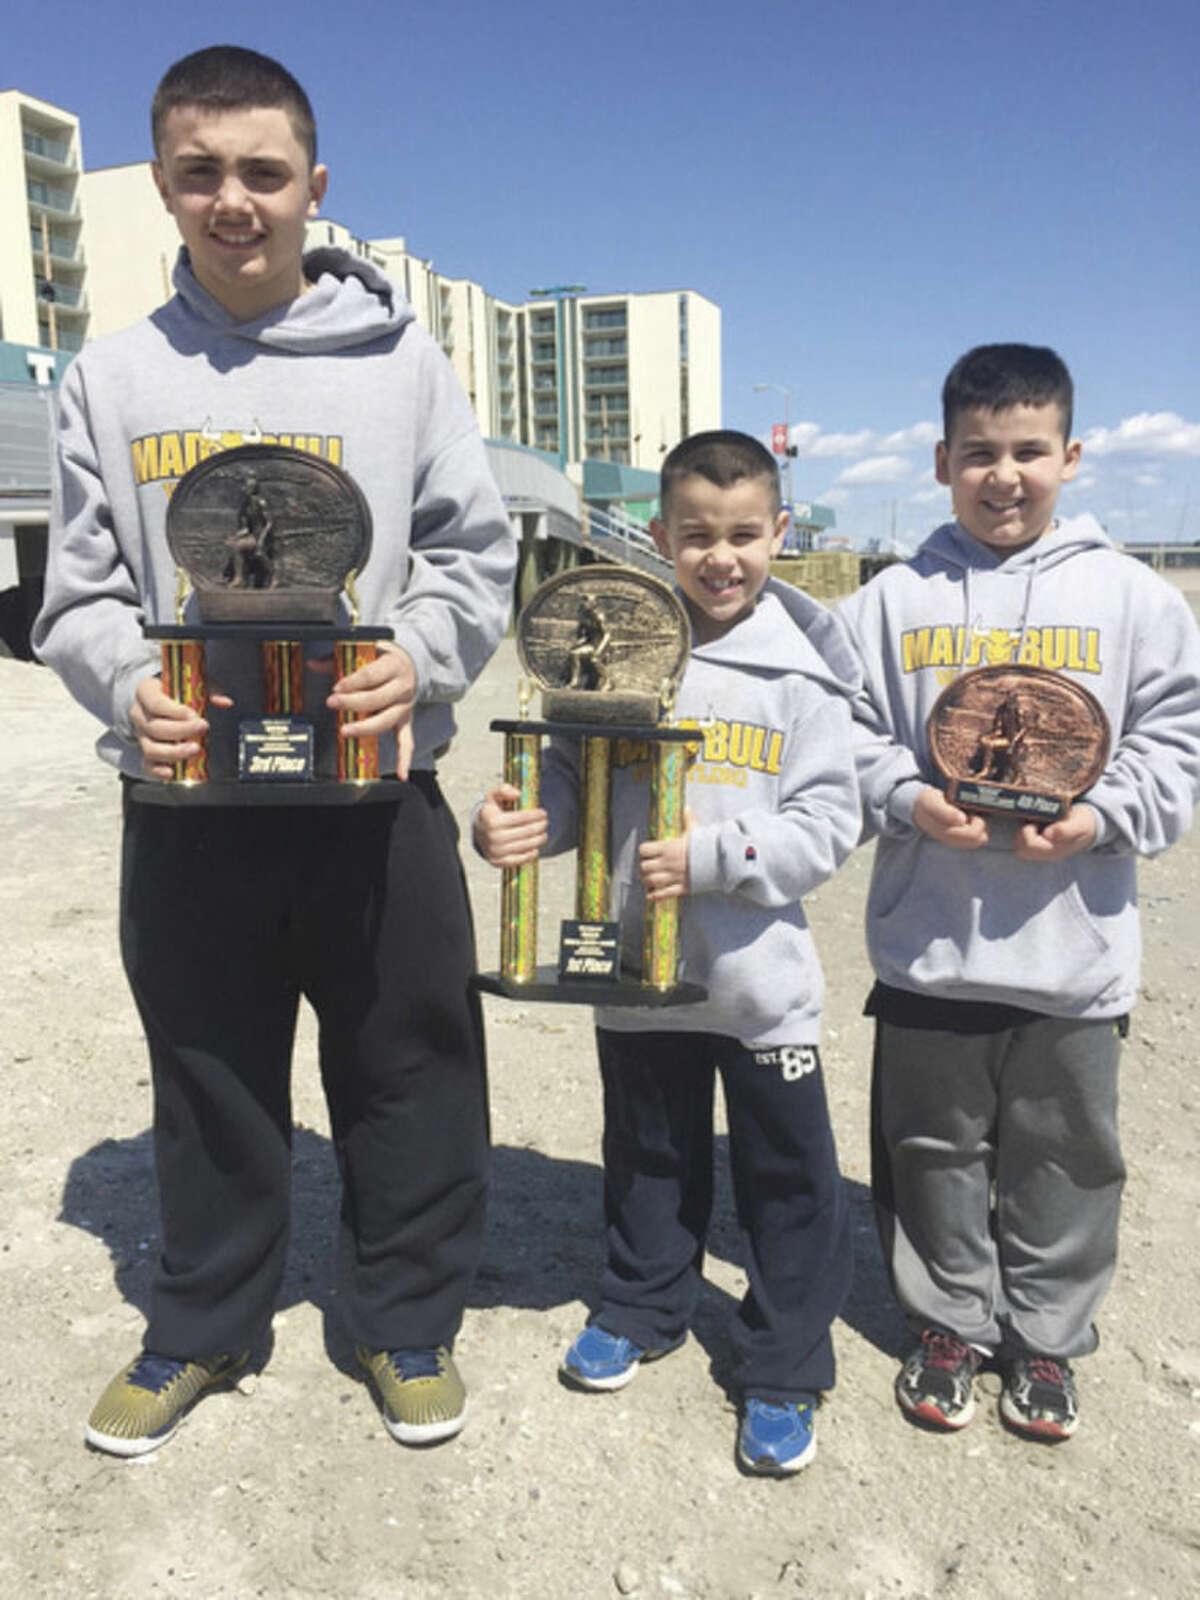 Youth Wrestling: Norwalk Mad Bull wrestlers shine at Jersey Shore